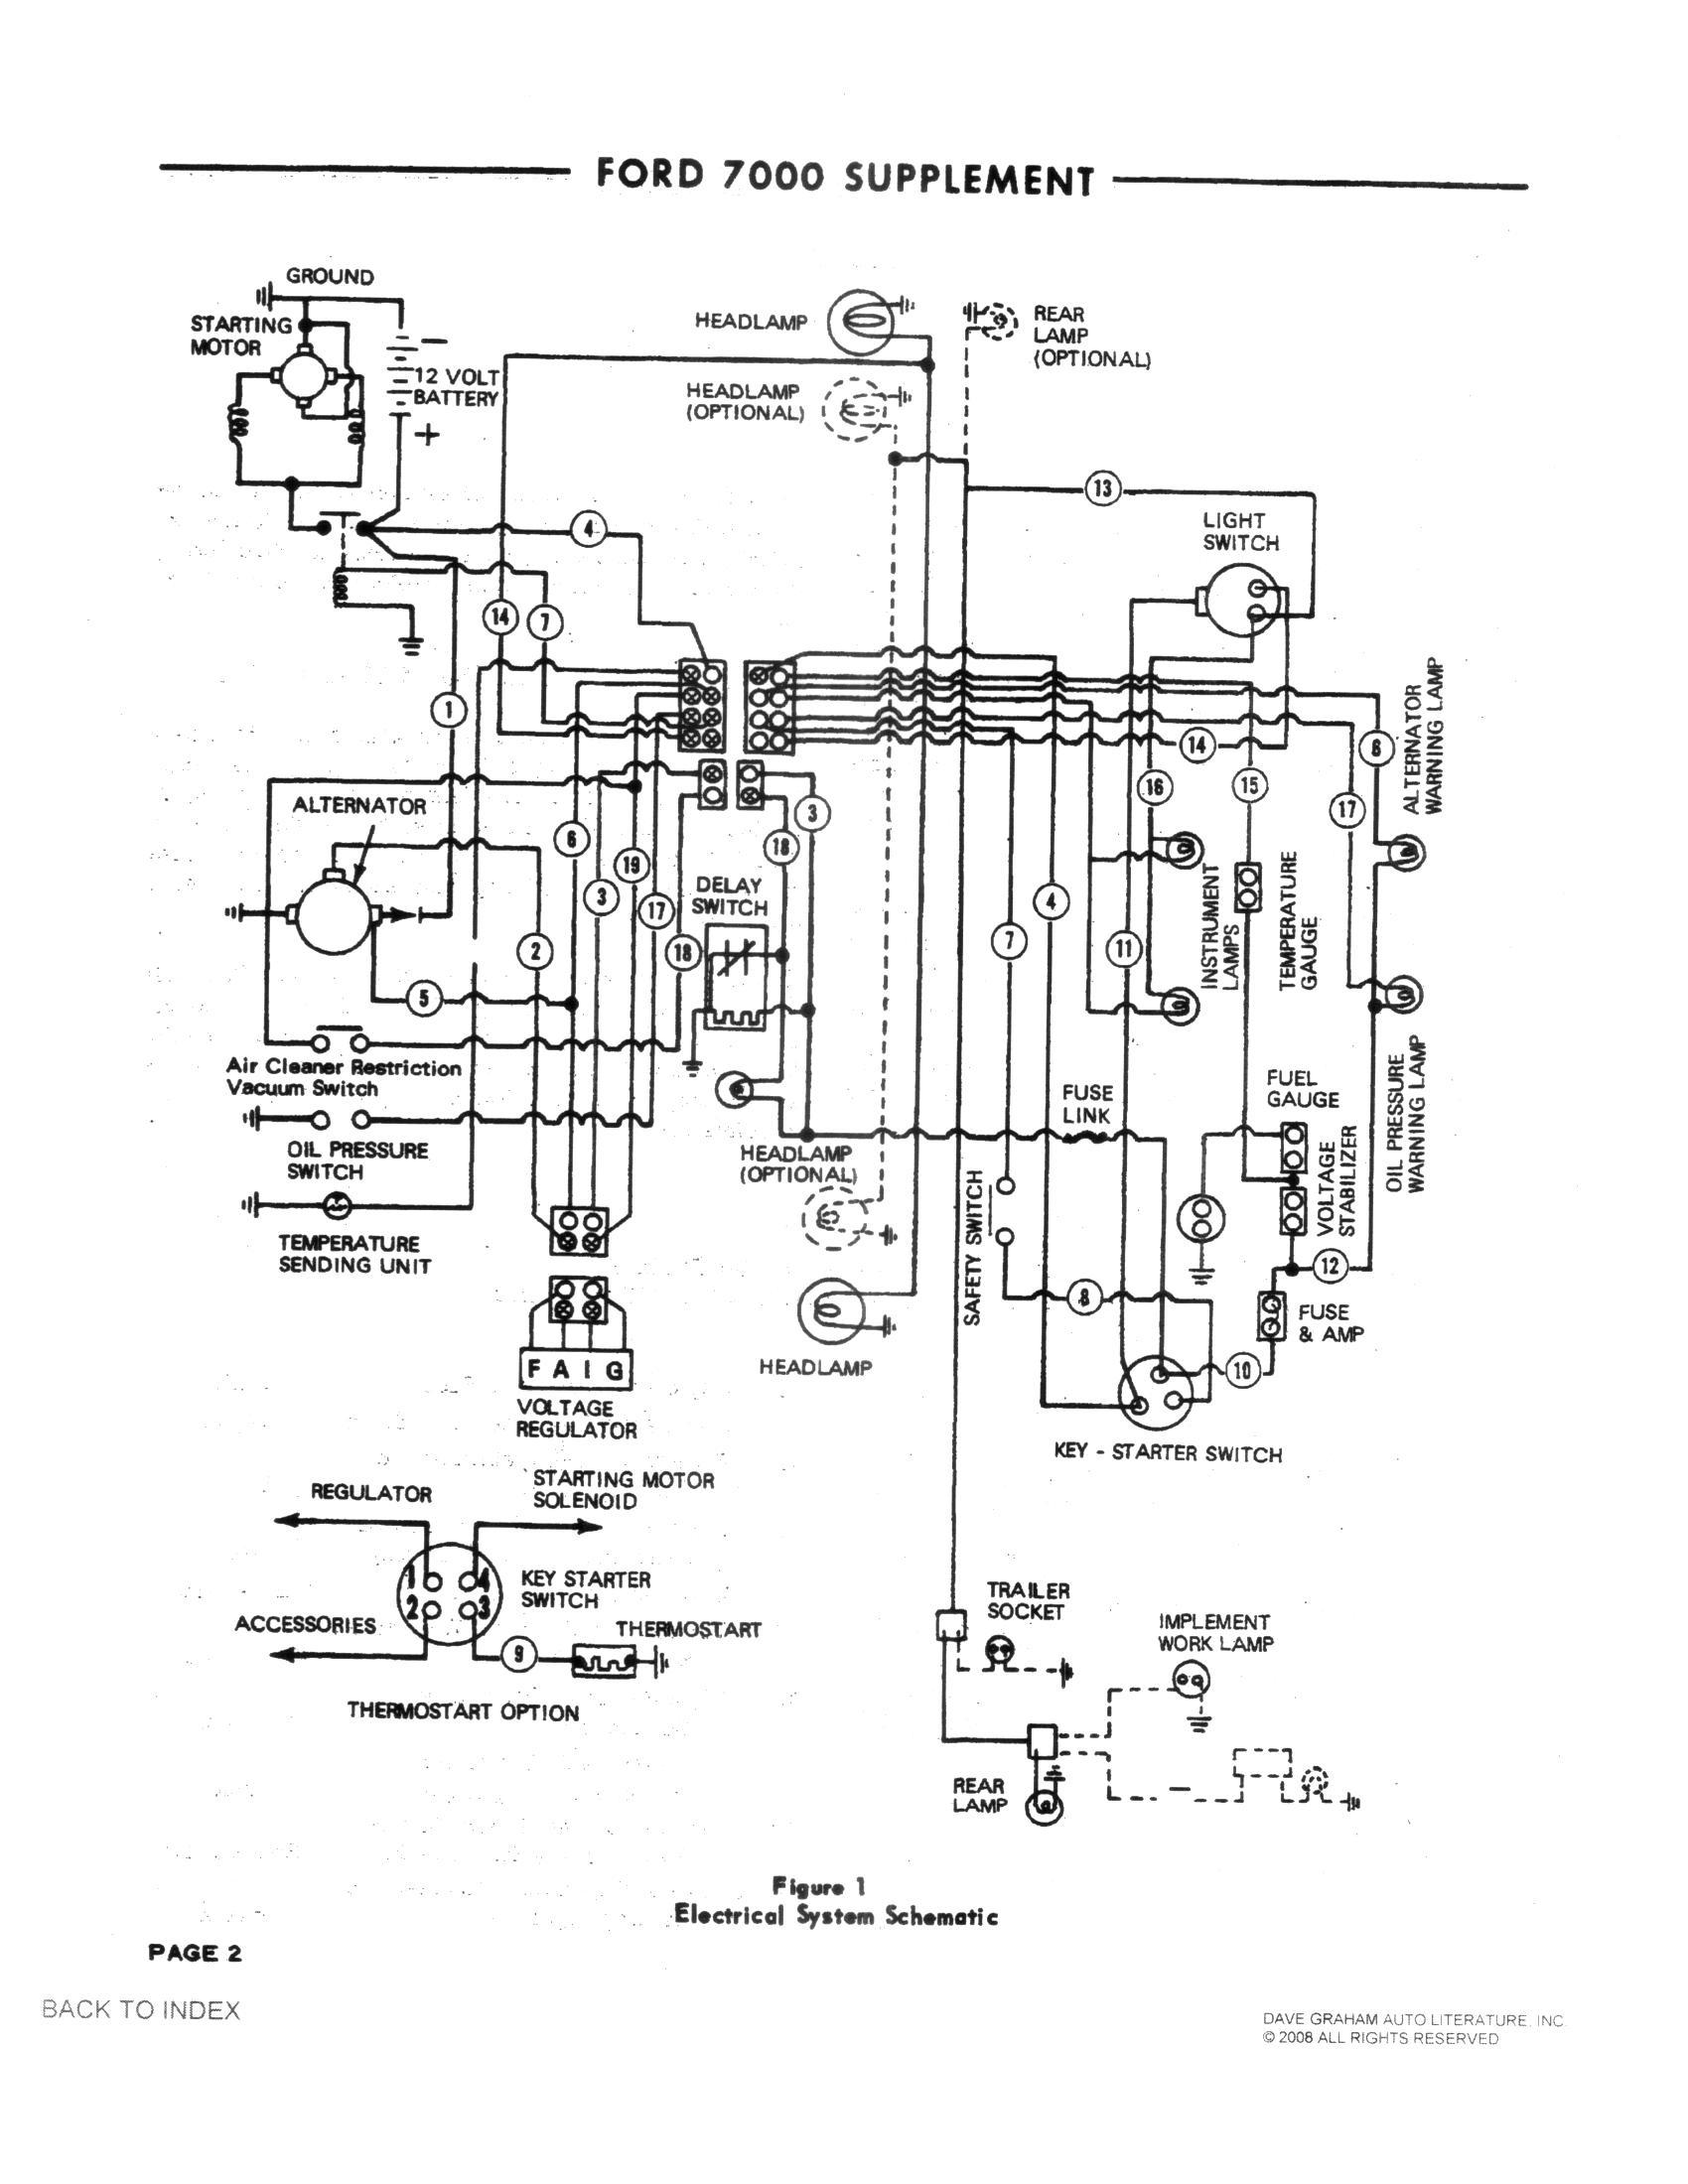 4500 ford backhoe wiring diagram vd 2175  mahindra 5500 wiring diagram  vd 2175  mahindra 5500 wiring diagram